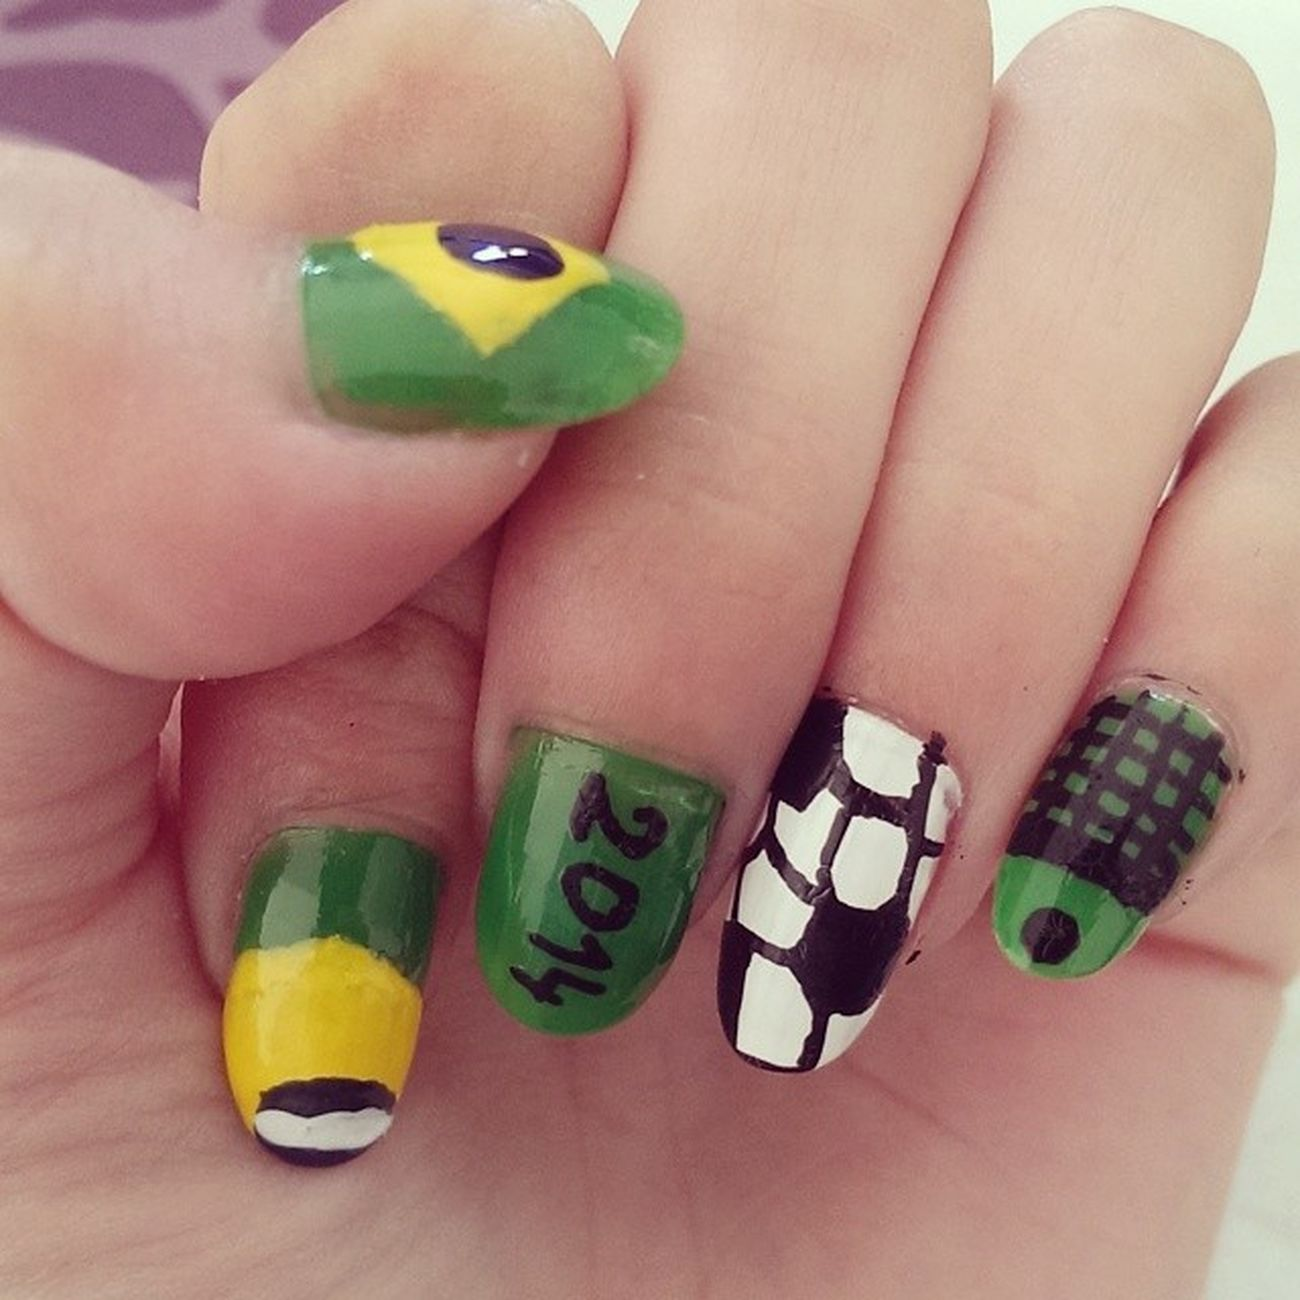 Coupe du monde nails Nails Nailart  Coupedumonde CDM WLNA coupedumondenailart ⚽?